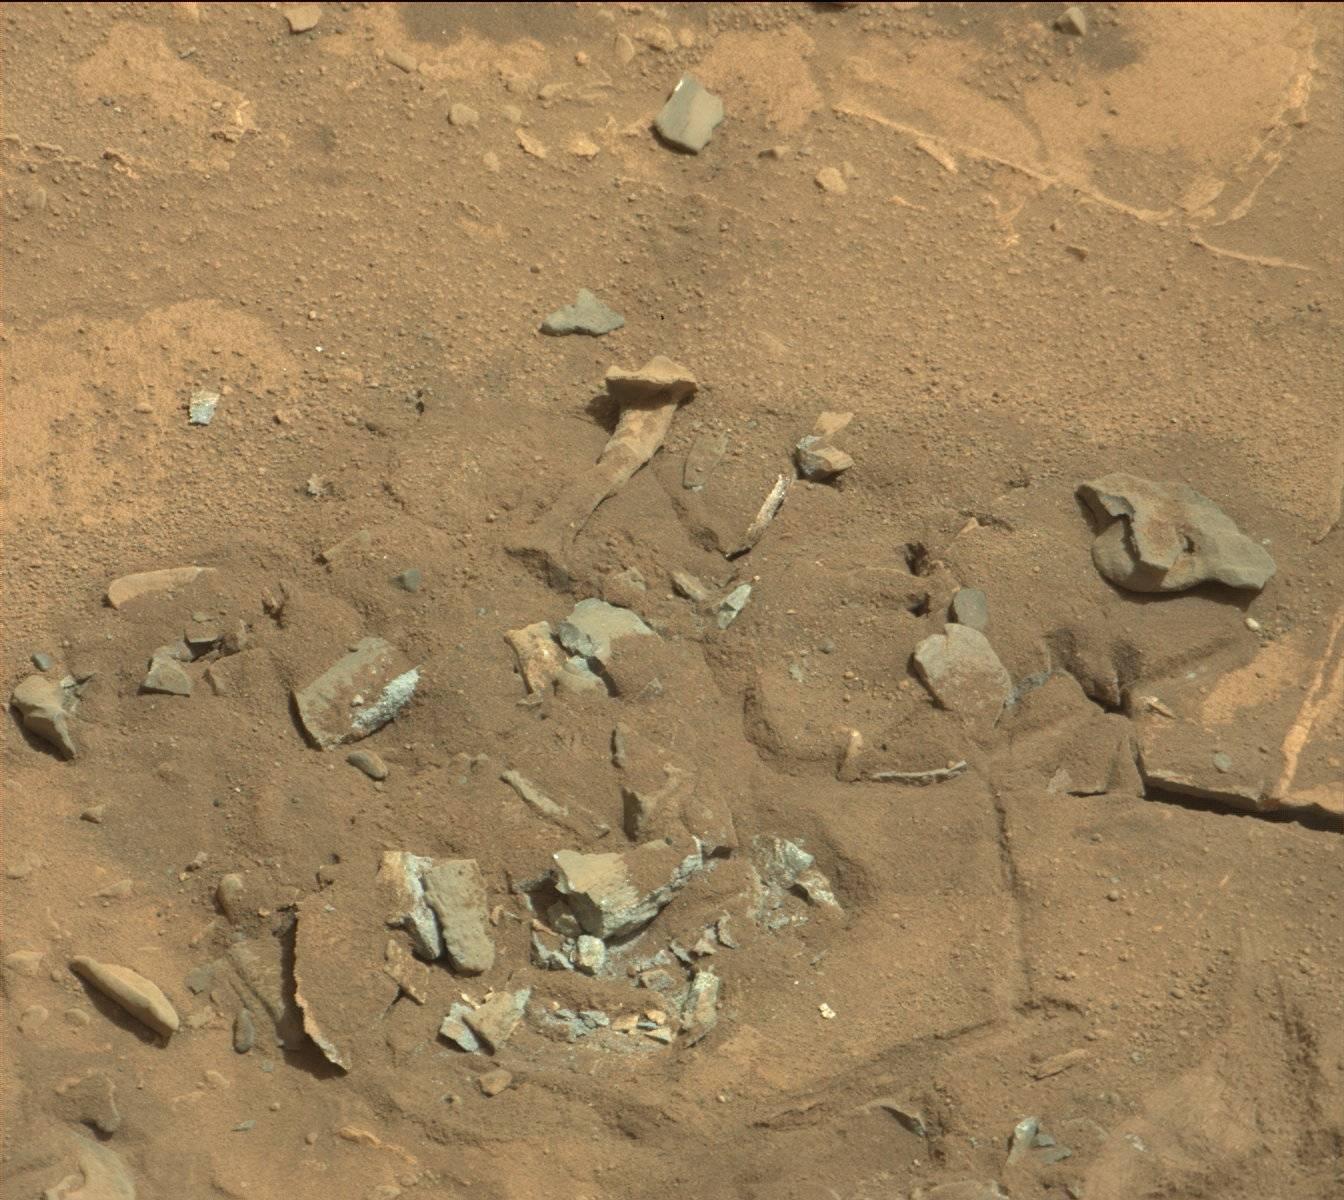 Curiosity fotografa una tibia umana su Marte